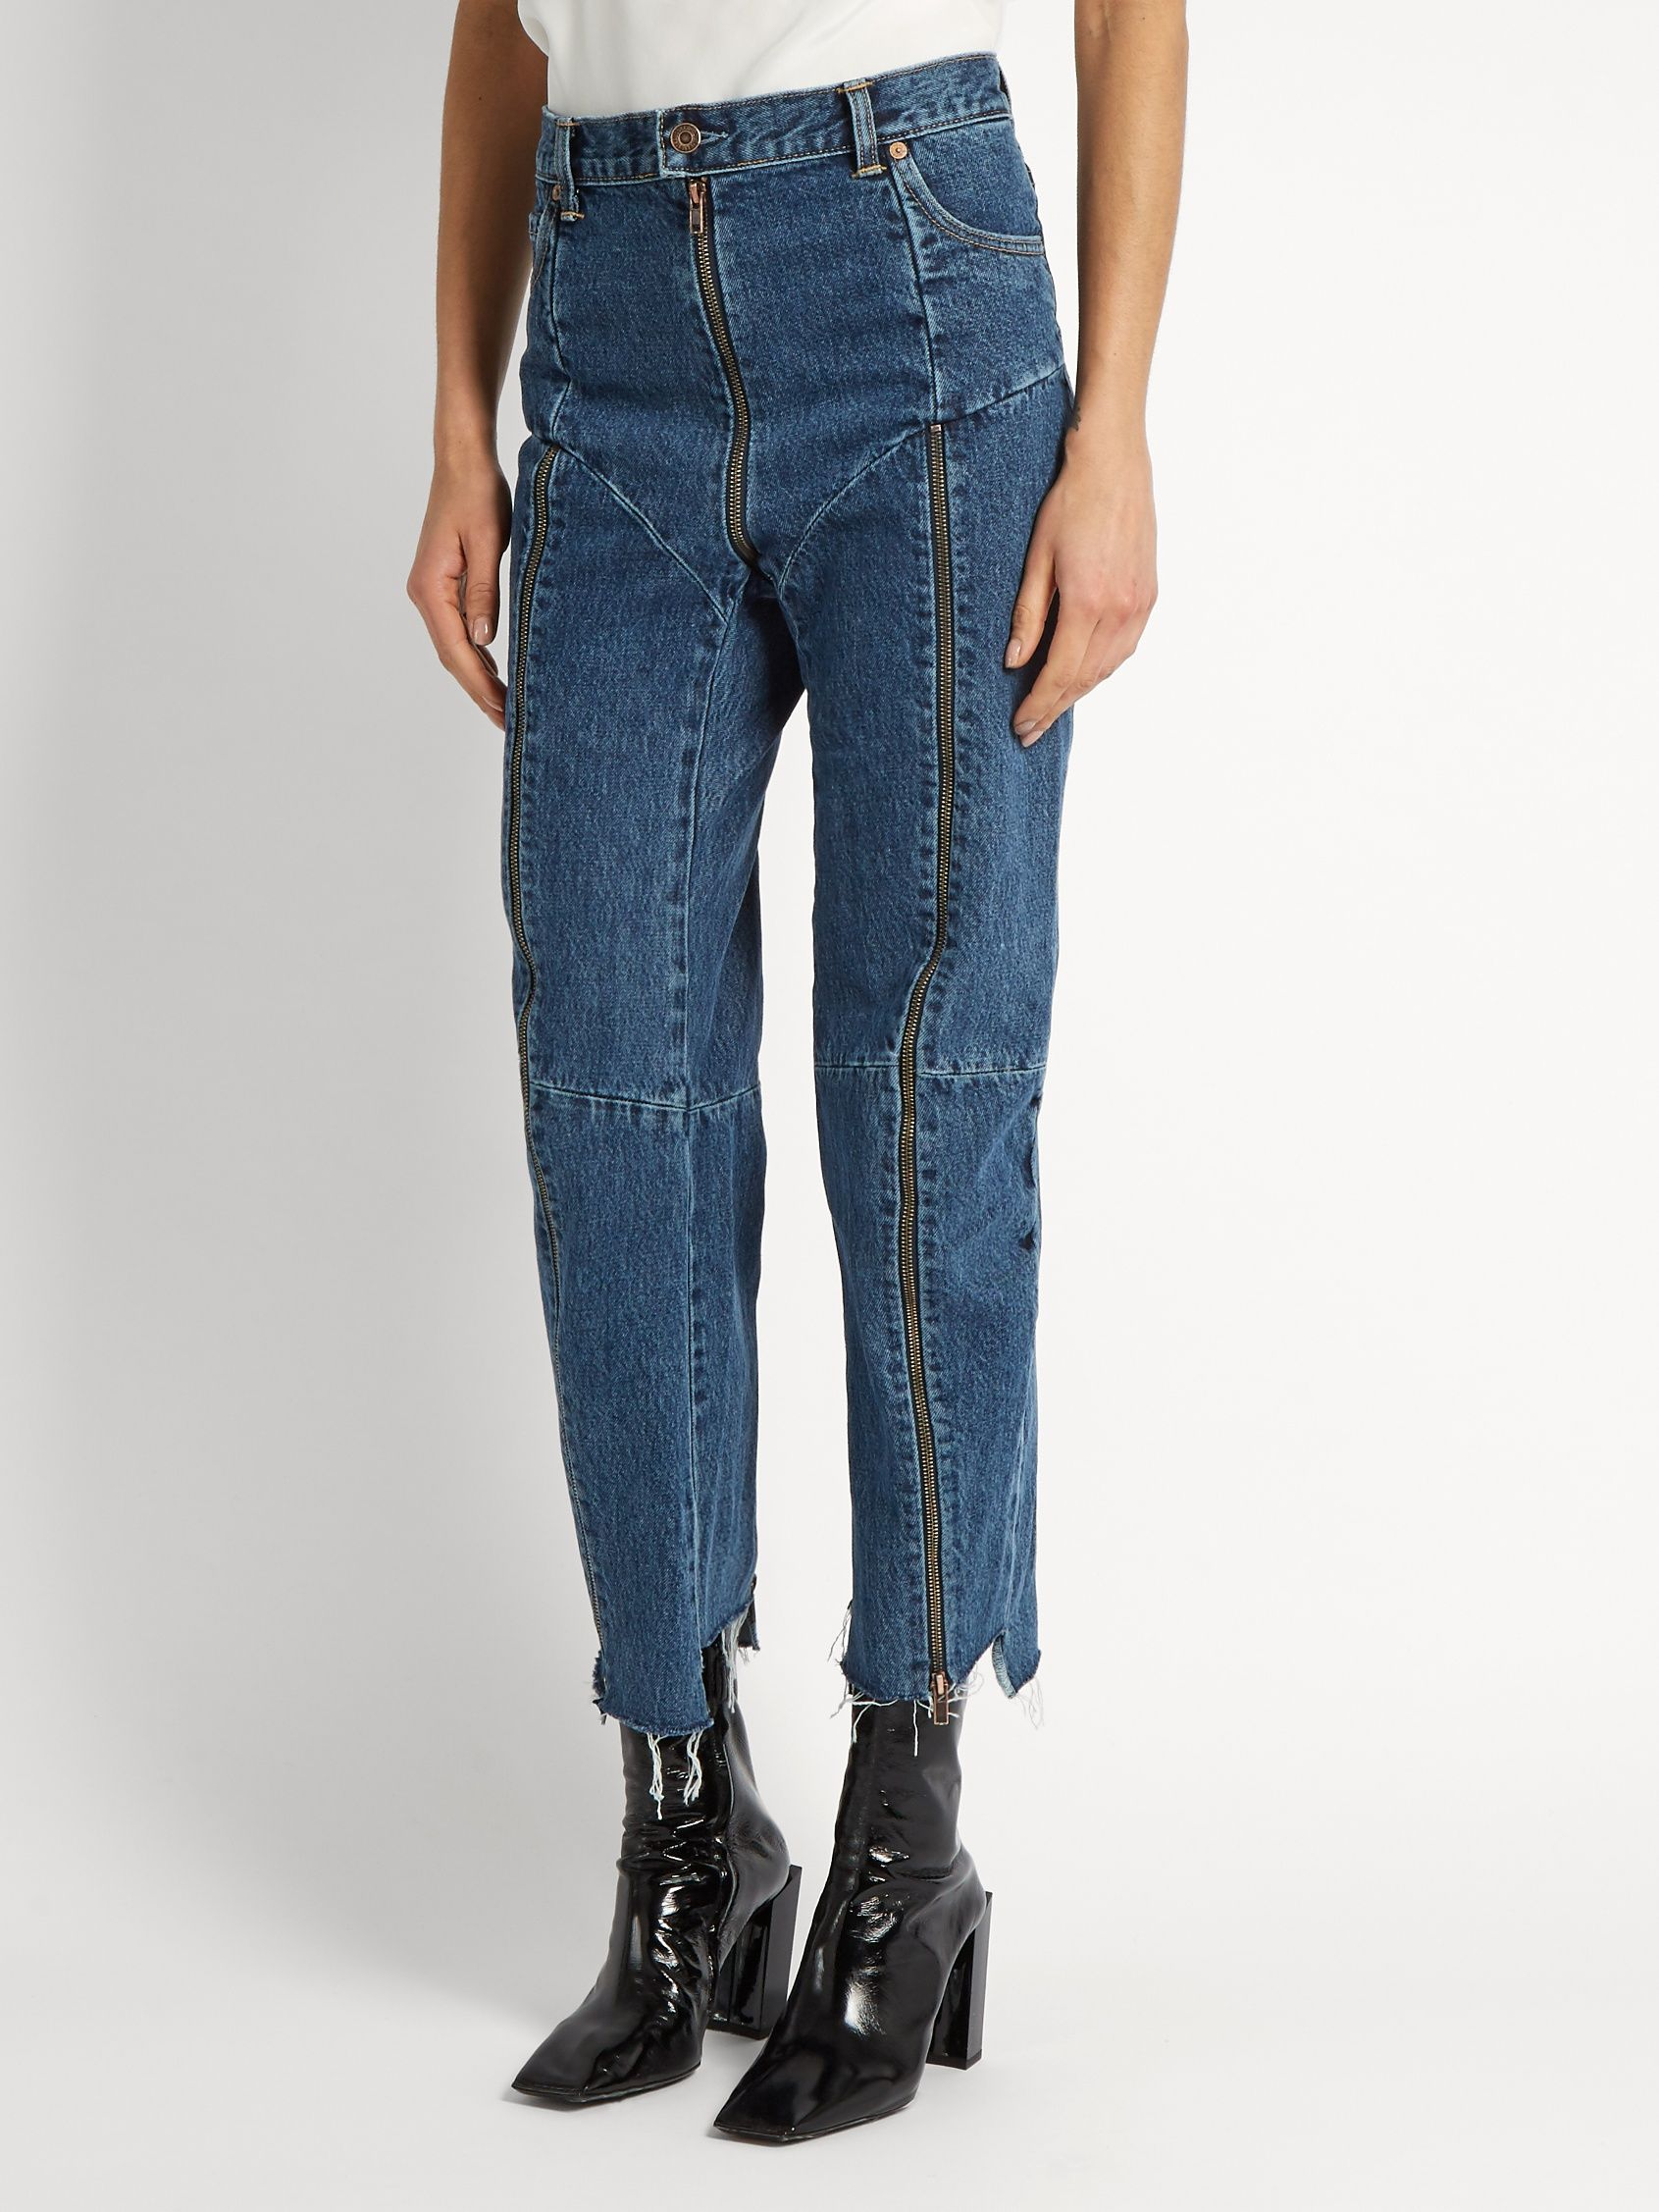 Petite women tapered leg jeans, free pics erotic nikki